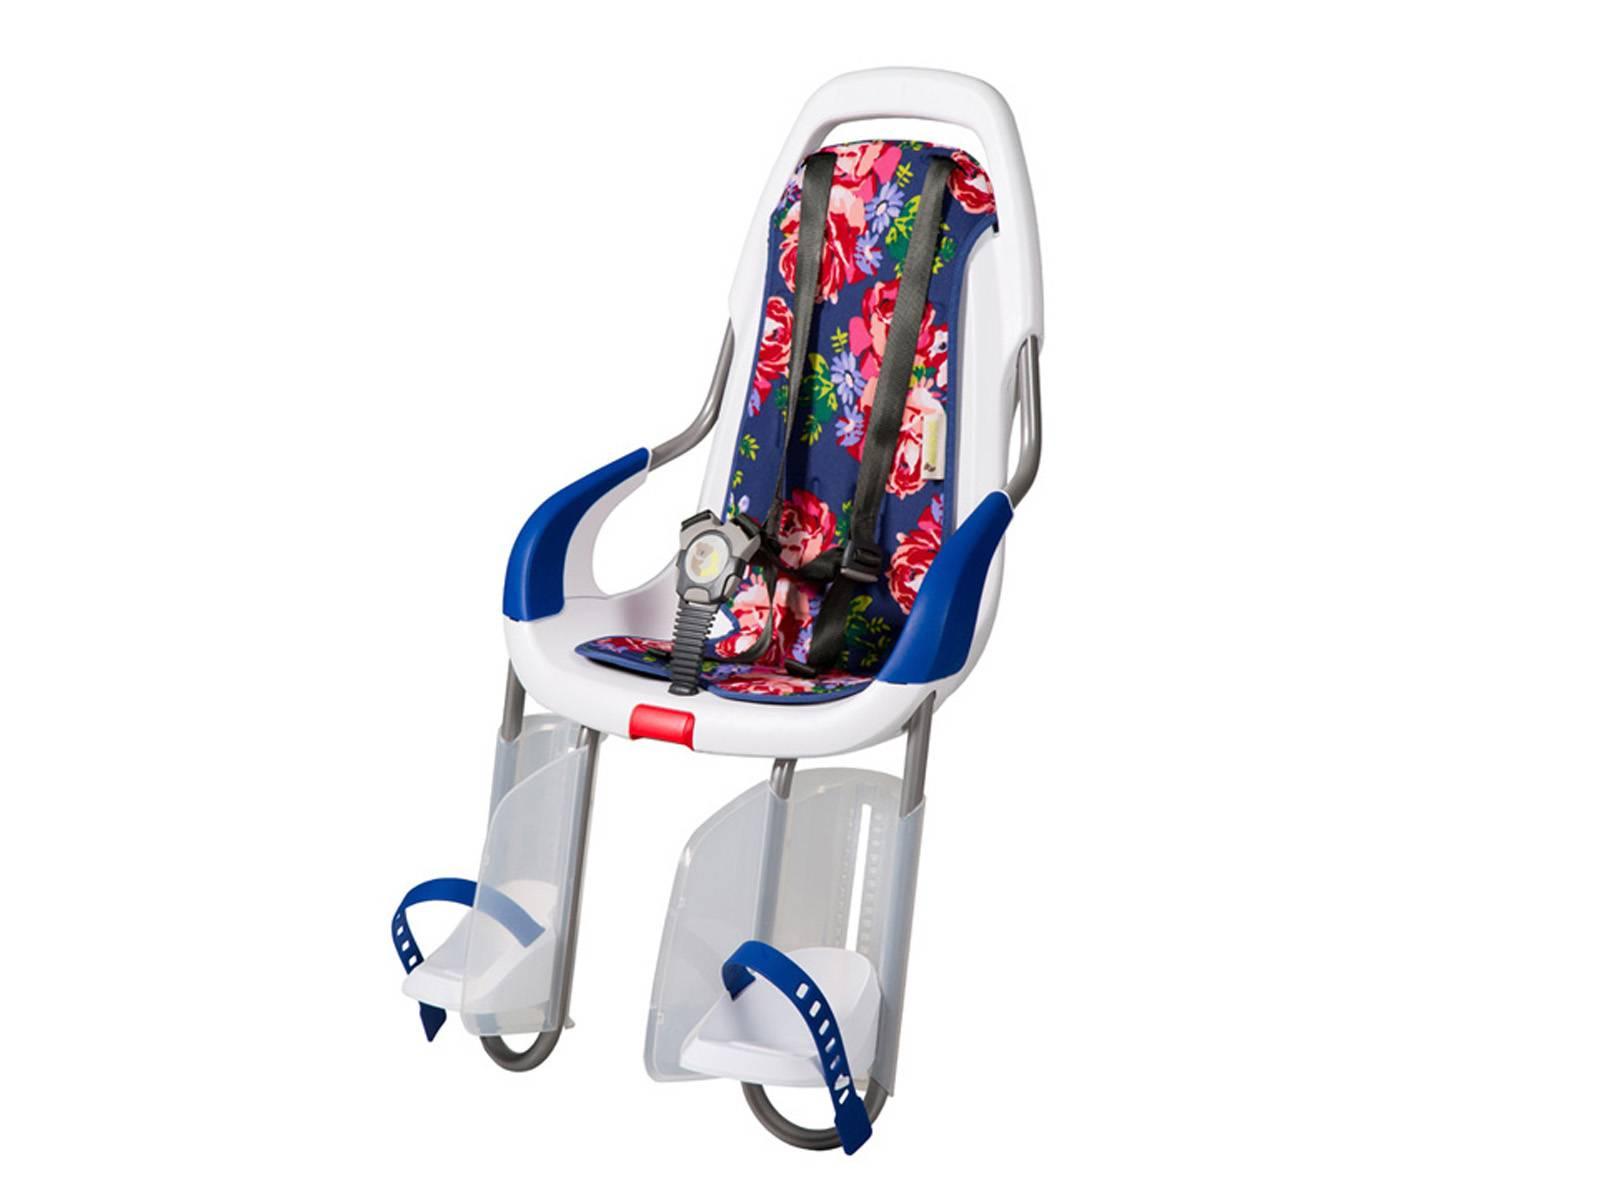 qibbel to go fahrrad kindersitz hinten roses blauw. Black Bedroom Furniture Sets. Home Design Ideas